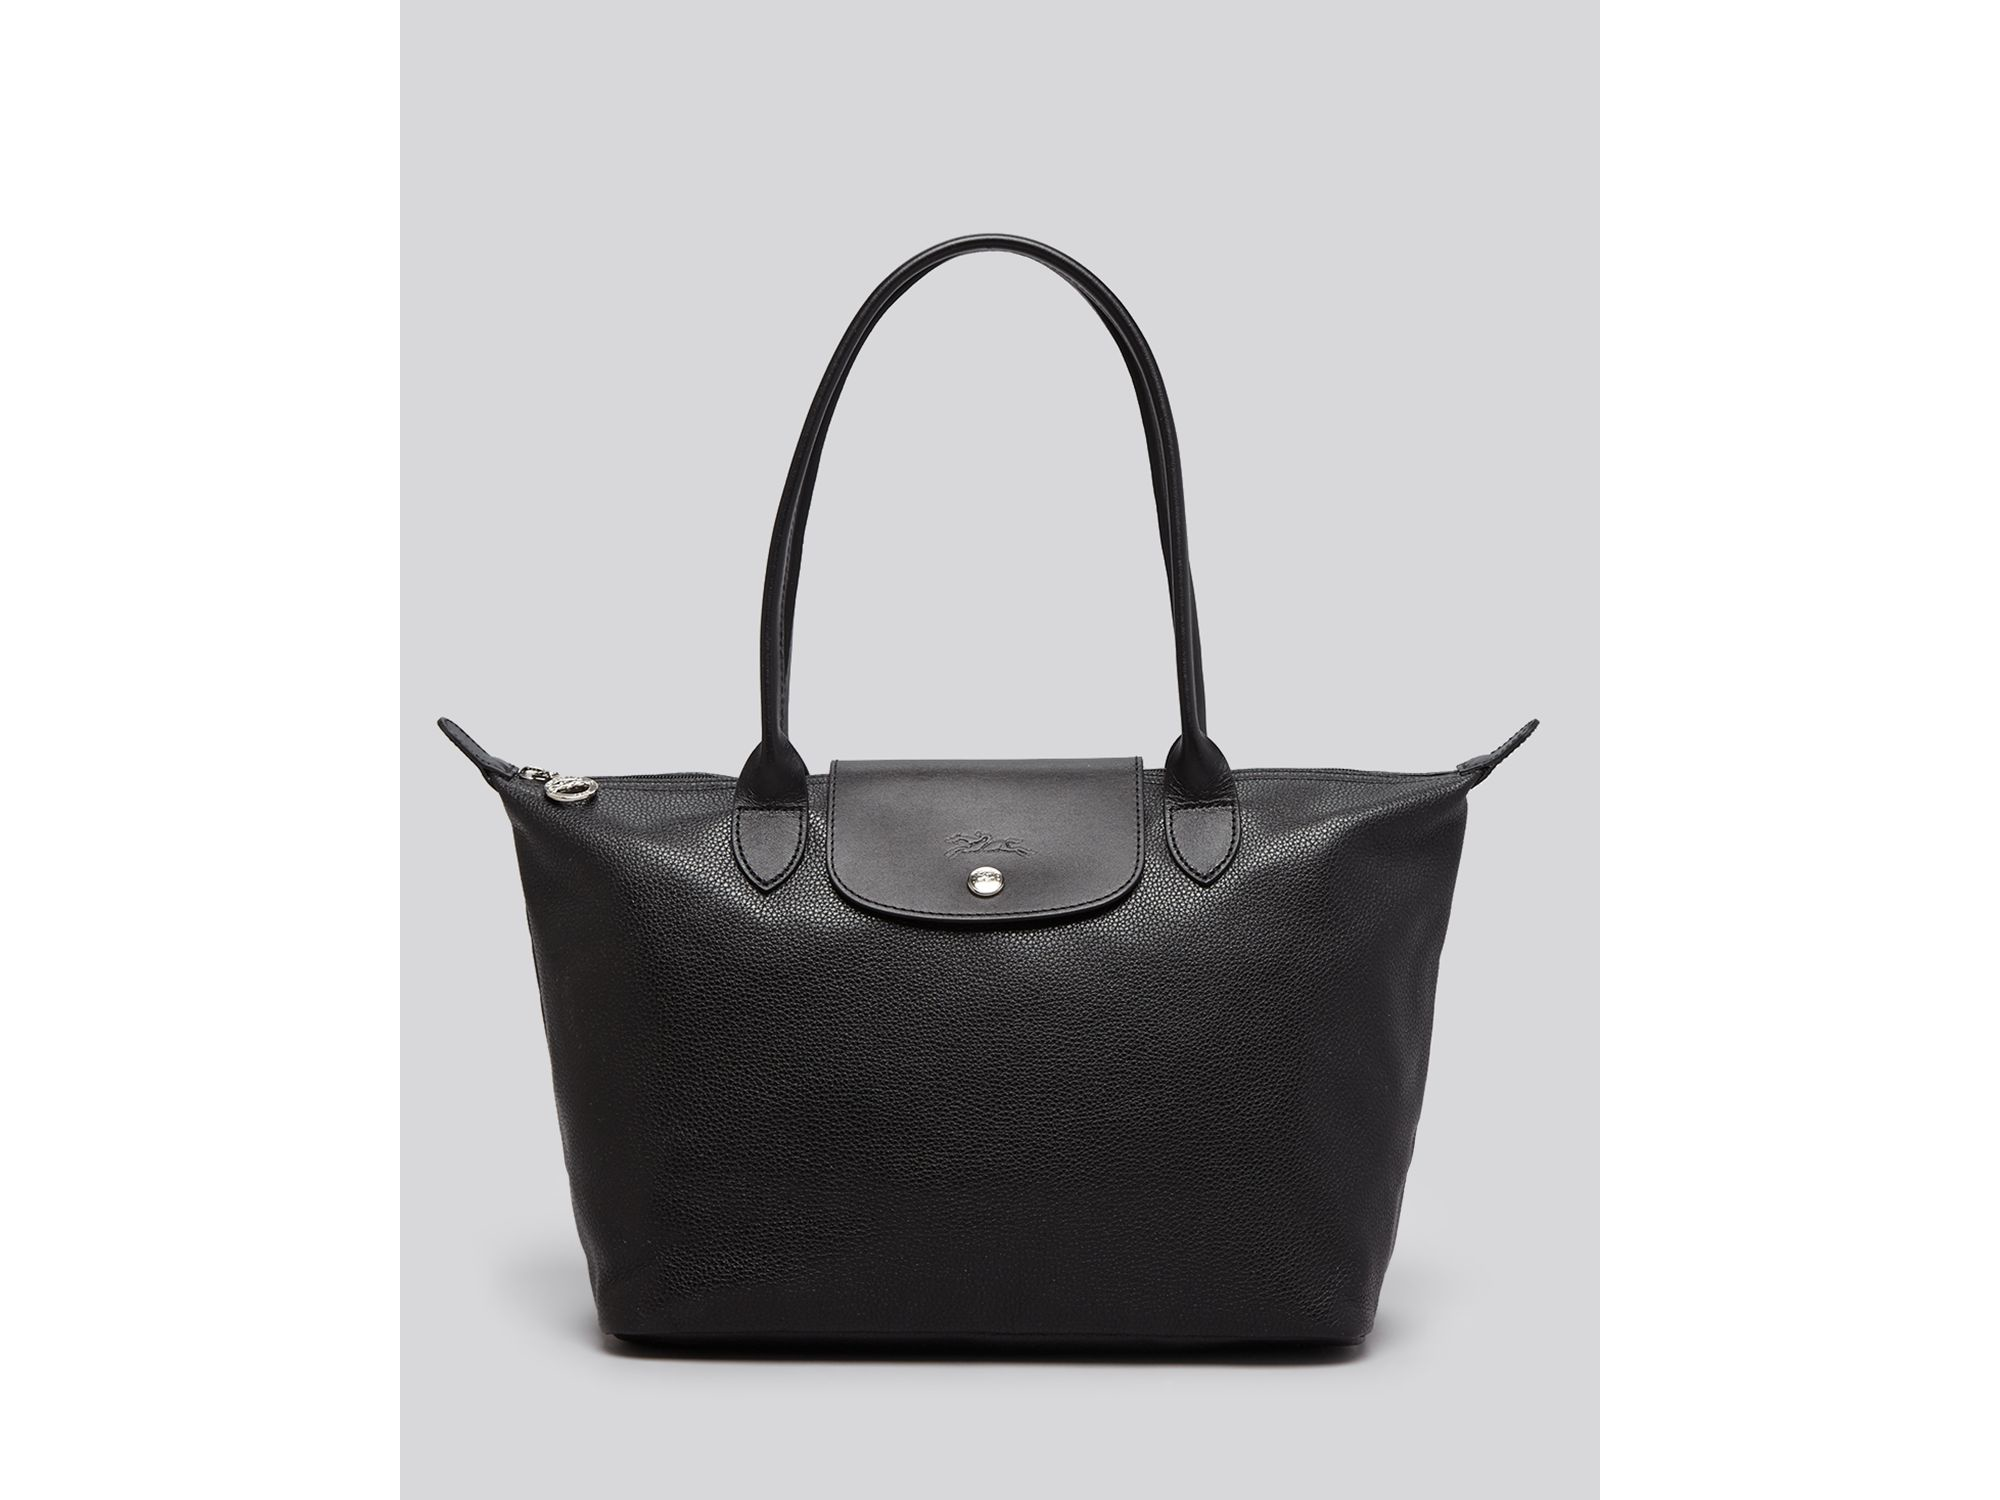 Lyst - Longchamp Veau Foulonne Zip Top Tote in Black e9eca029e7